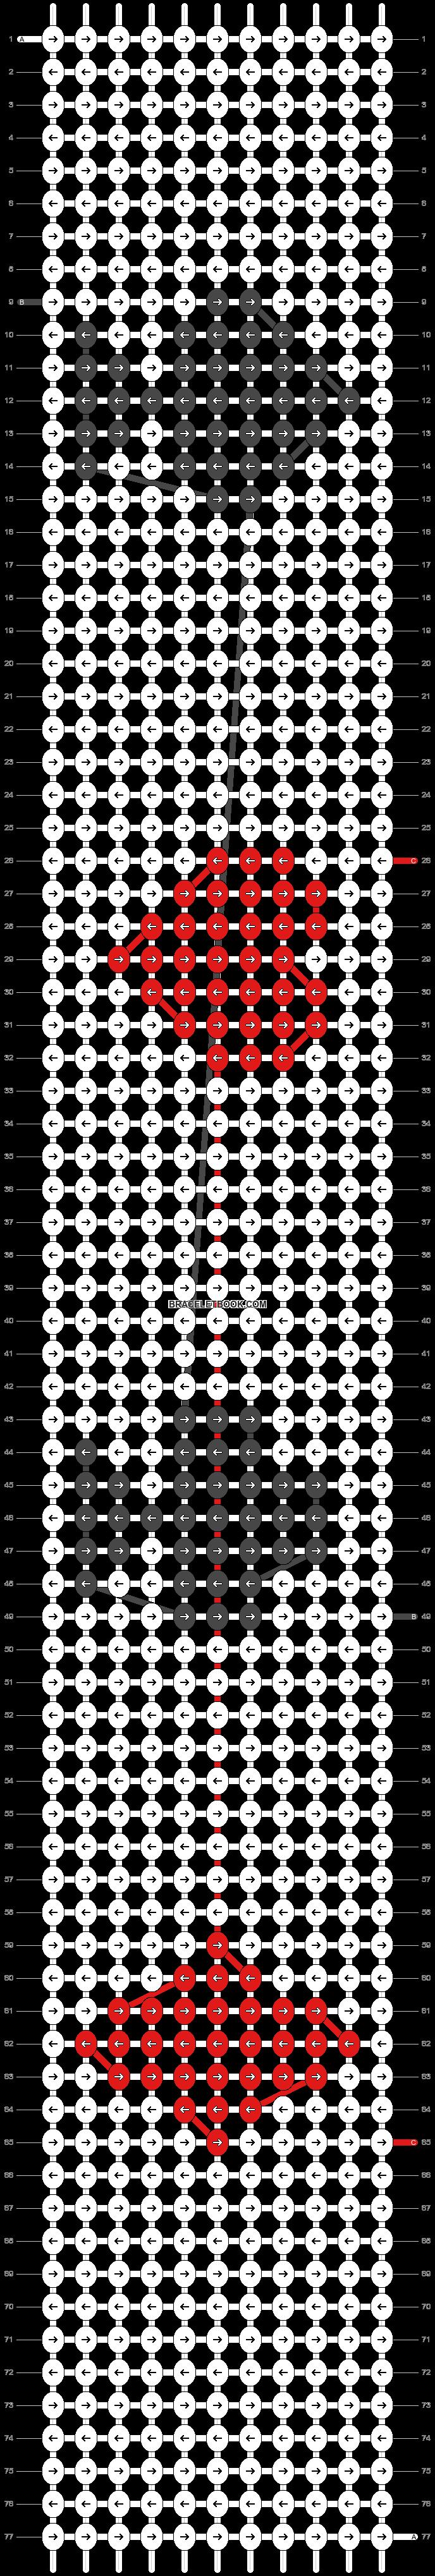 Alpha pattern #43524 pattern